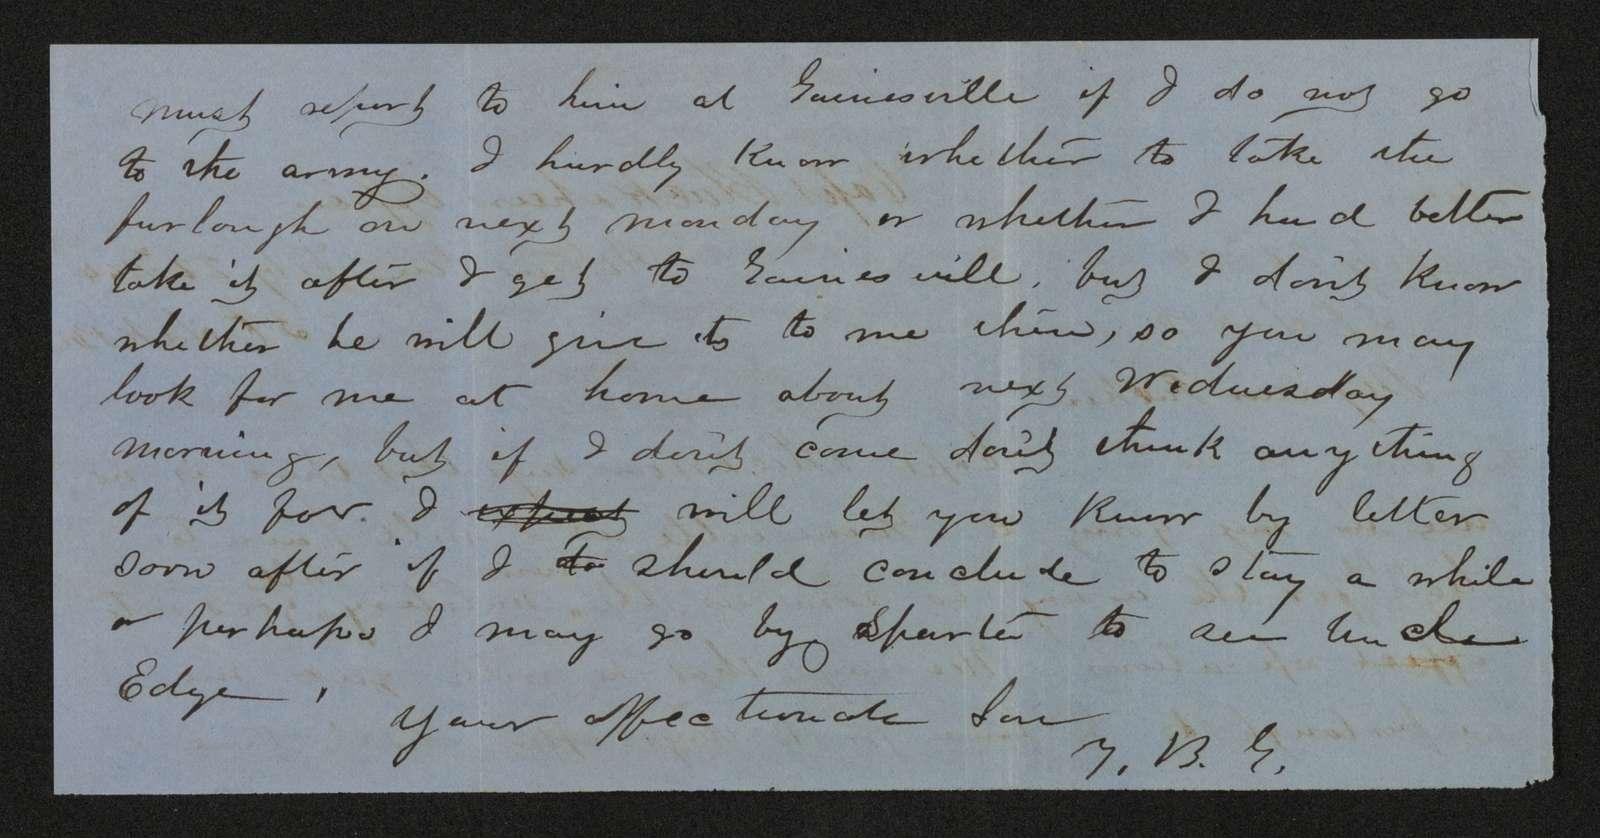 Lewis H. Machen Family Papers: Gresham Family Correspondence, 1834-1925; 1864-1865